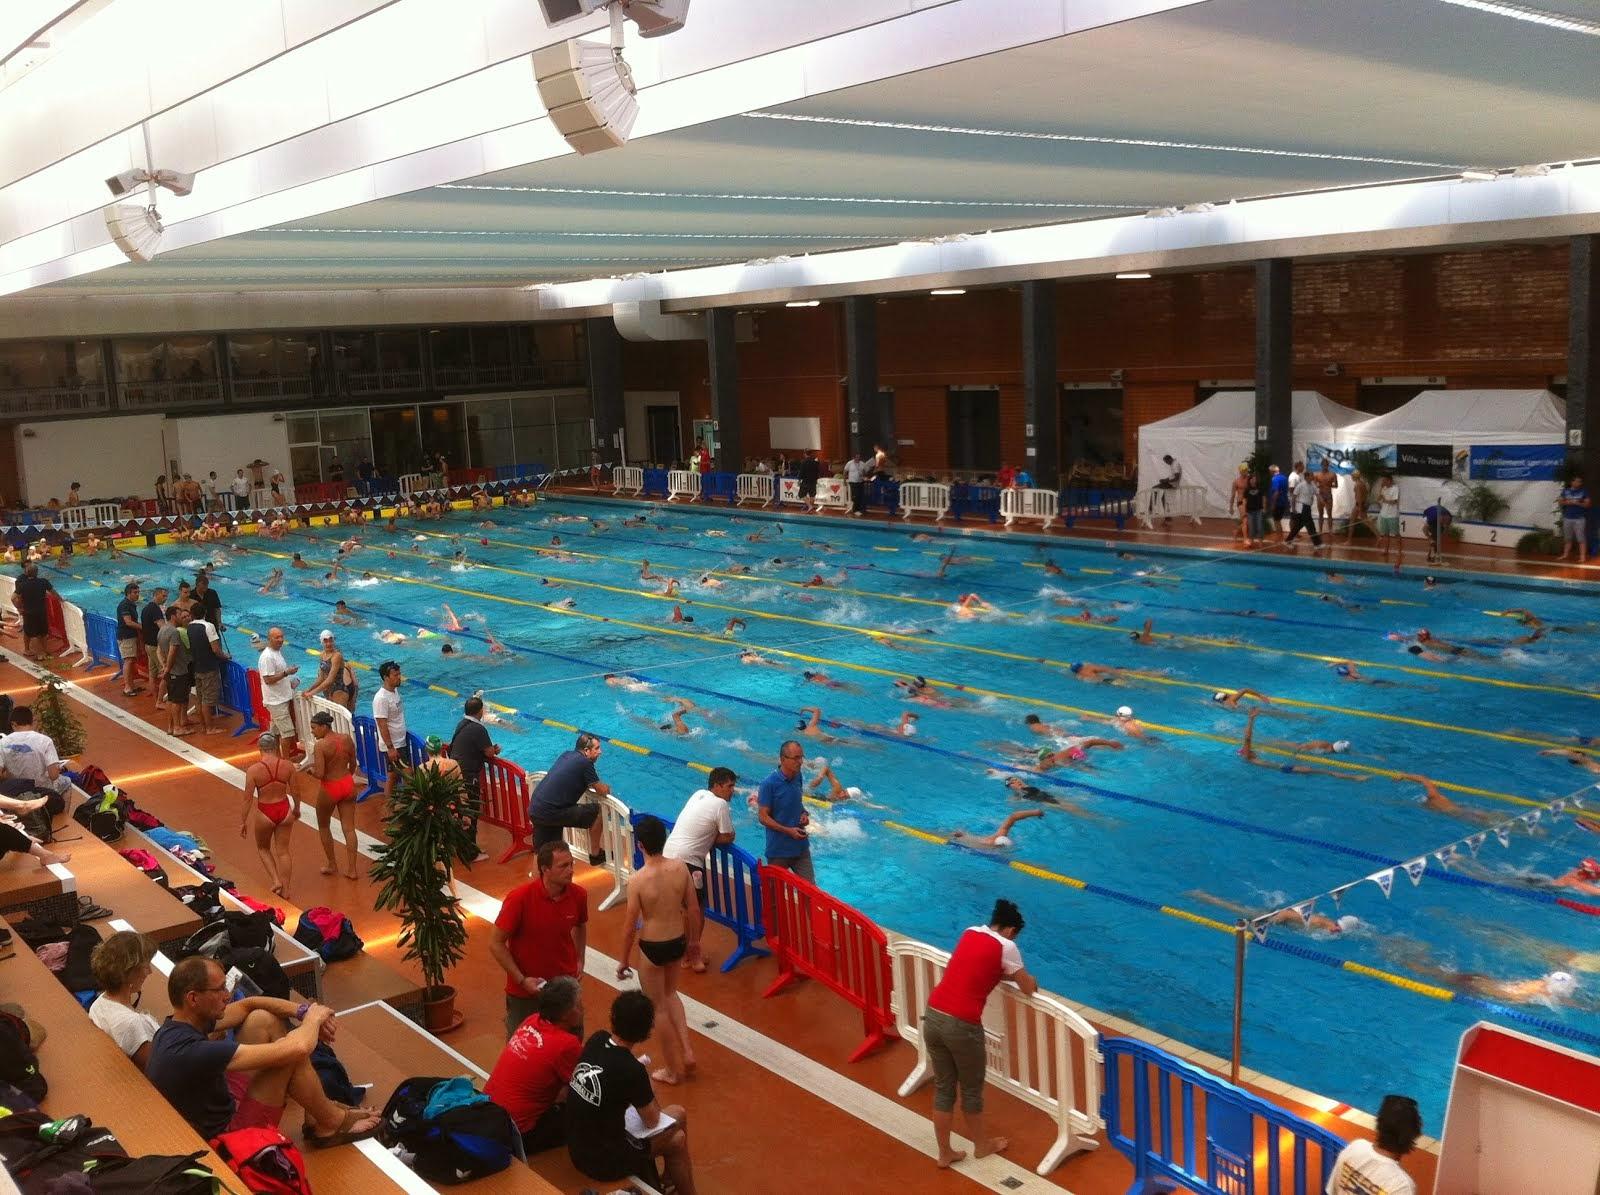 Les derni res nouvelles ecn club de natation ecn for Piscine brequigny